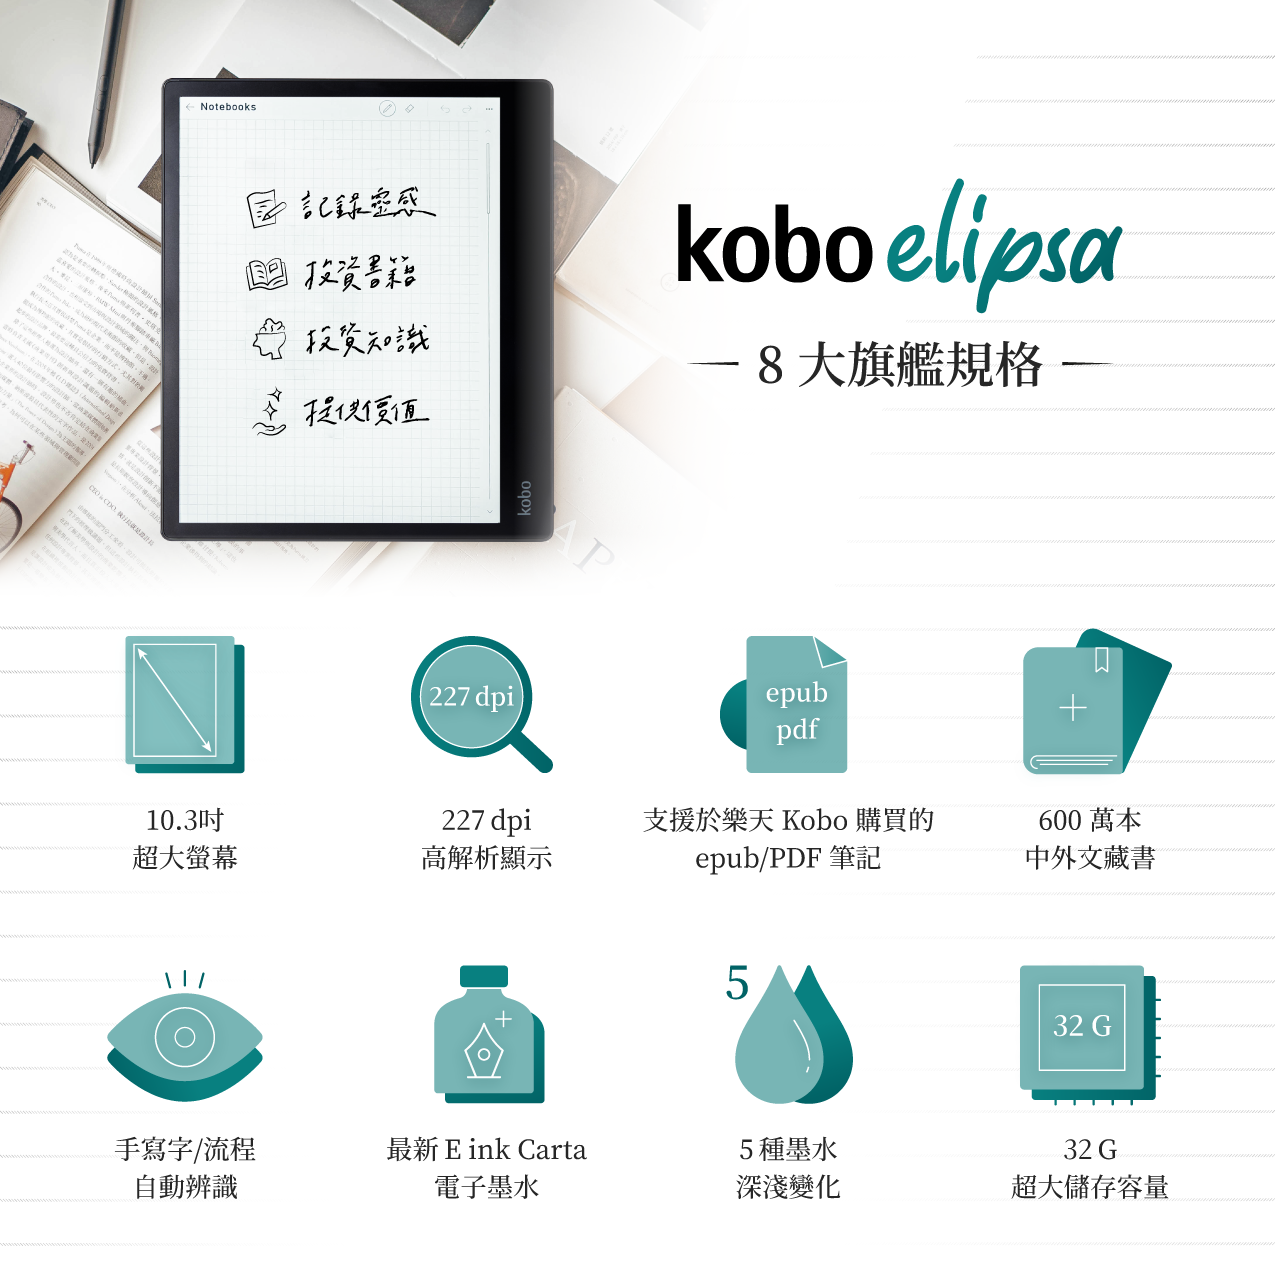 Kobo Elipsa 規格說明